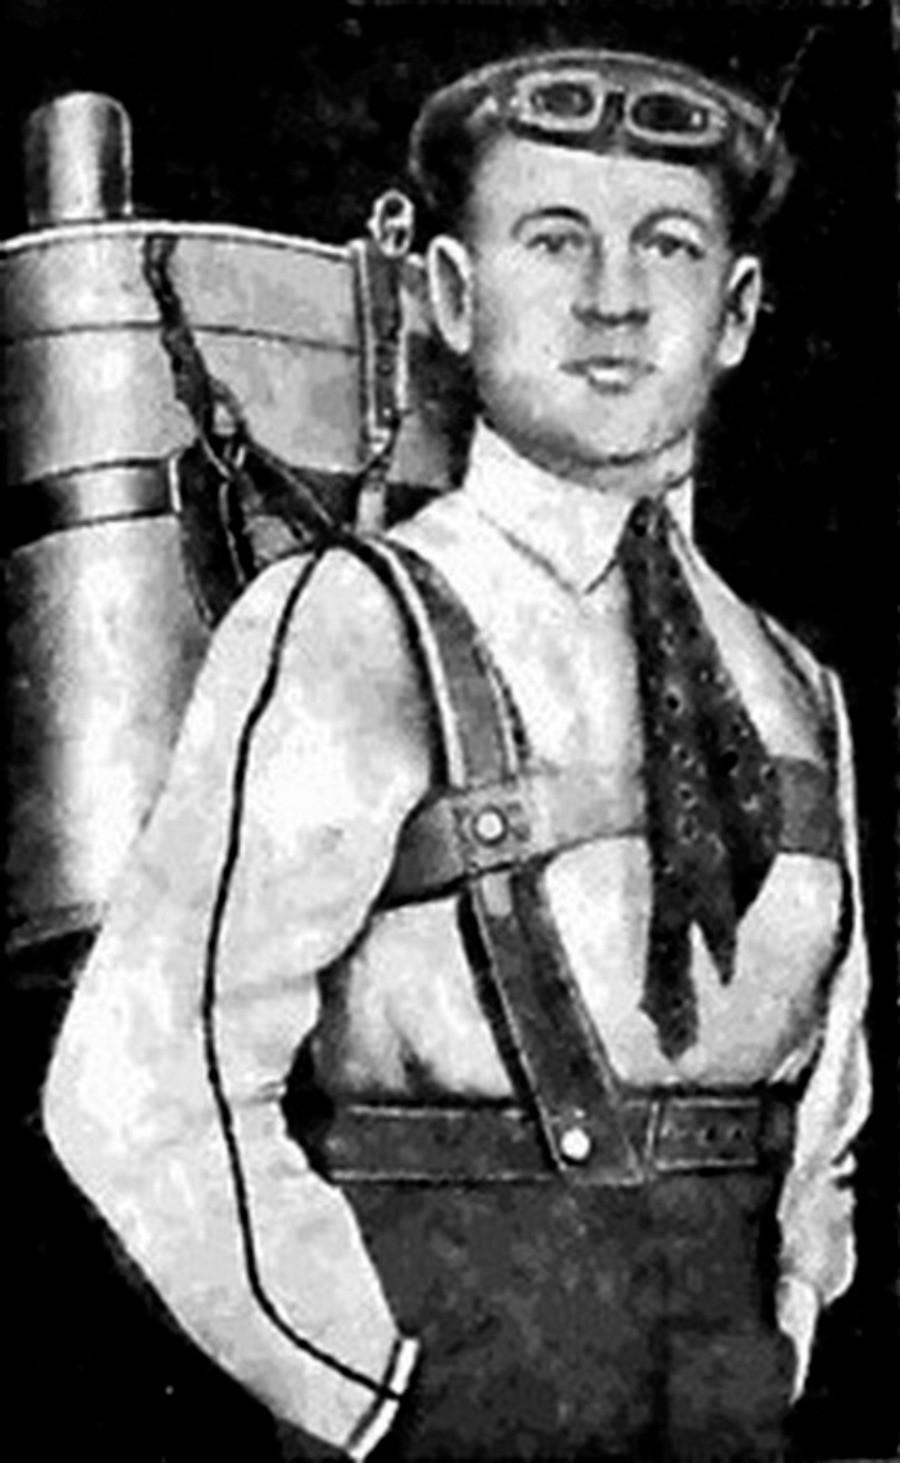 Gleb Kotelnikov mengenakan parasut ransel.